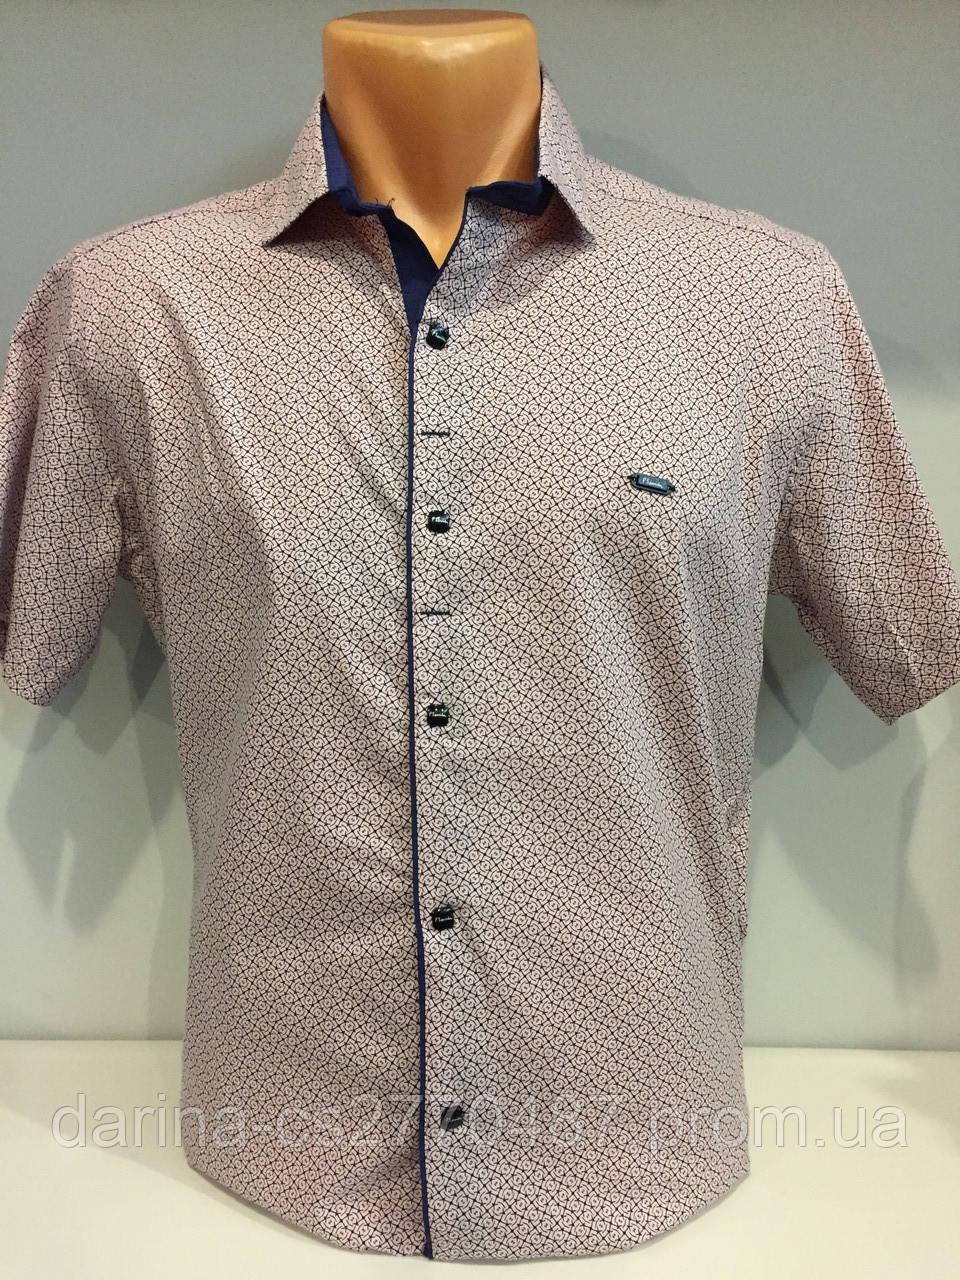 Мужская рубашка на кнопках с коротким рукавом S-2XL